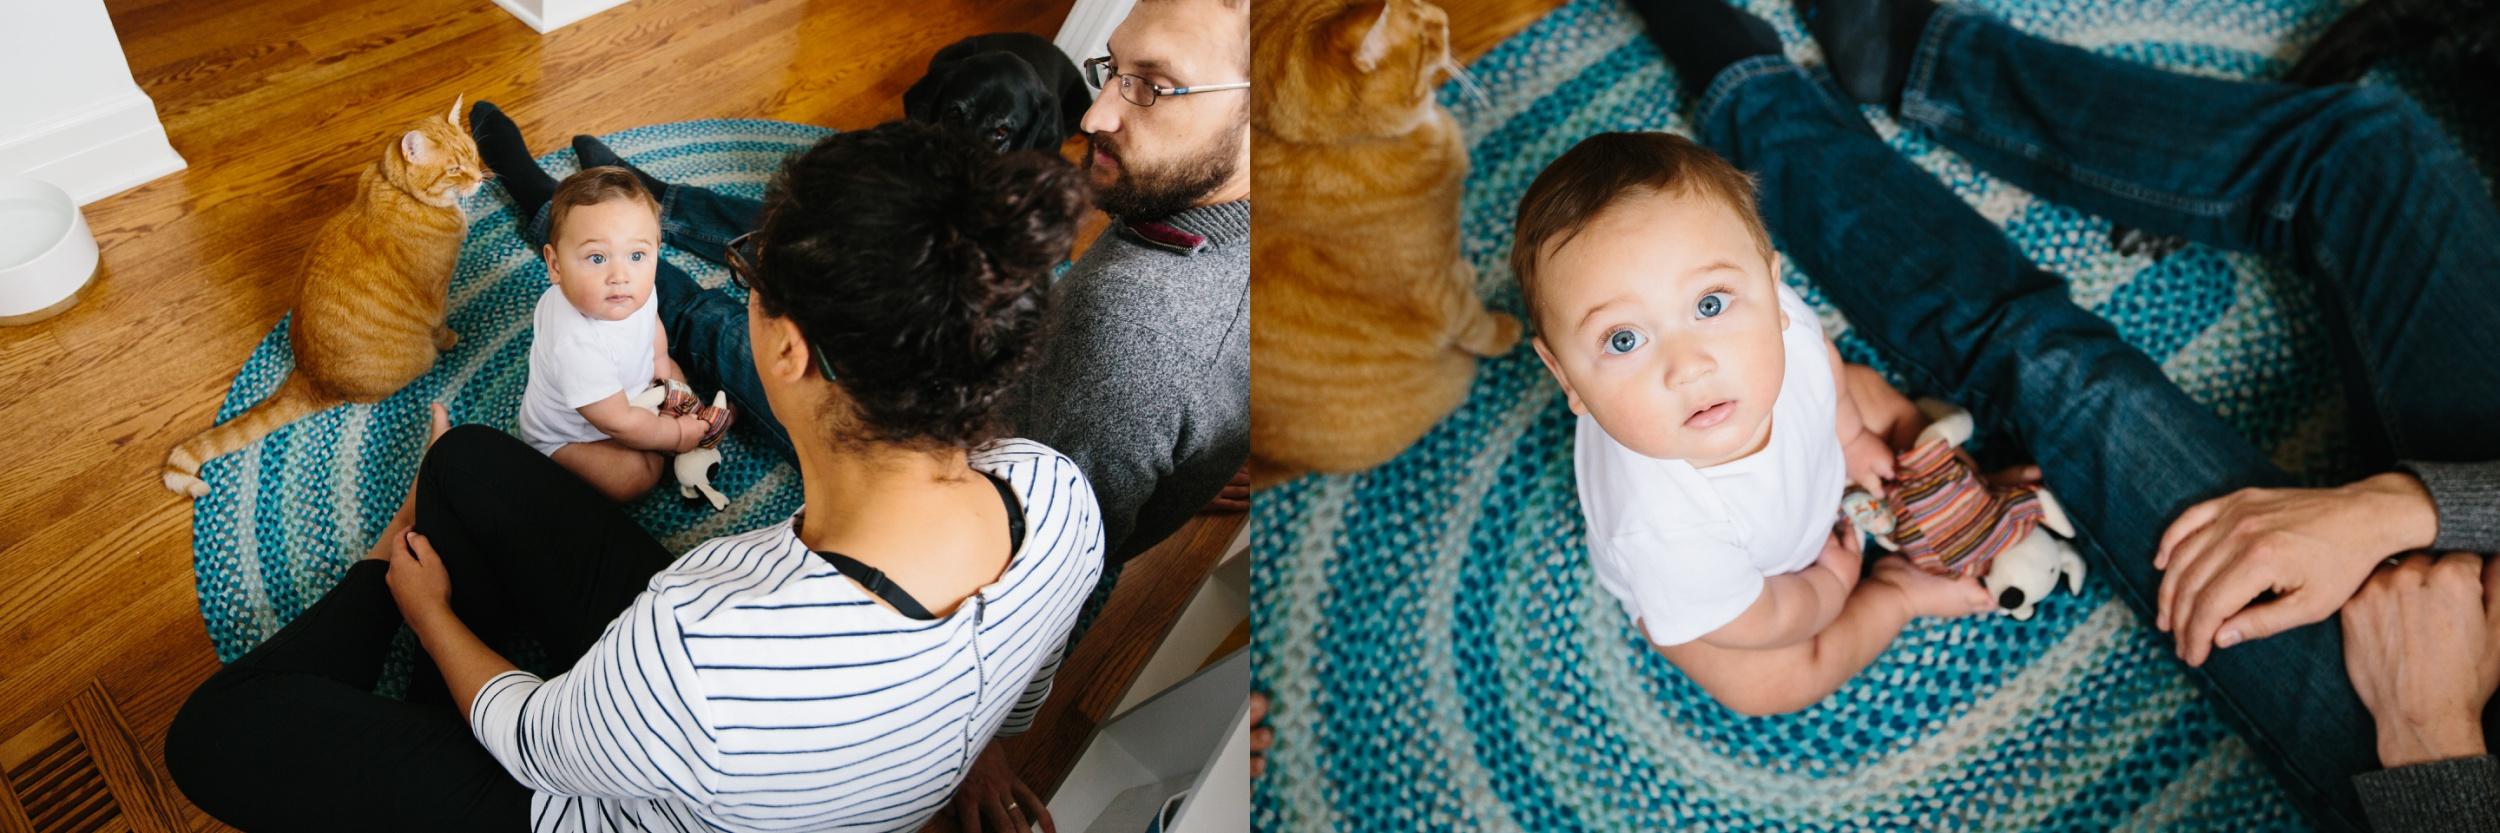 oklahoma-family-photography-newborn-baby-milestone-lifestyle.jpg